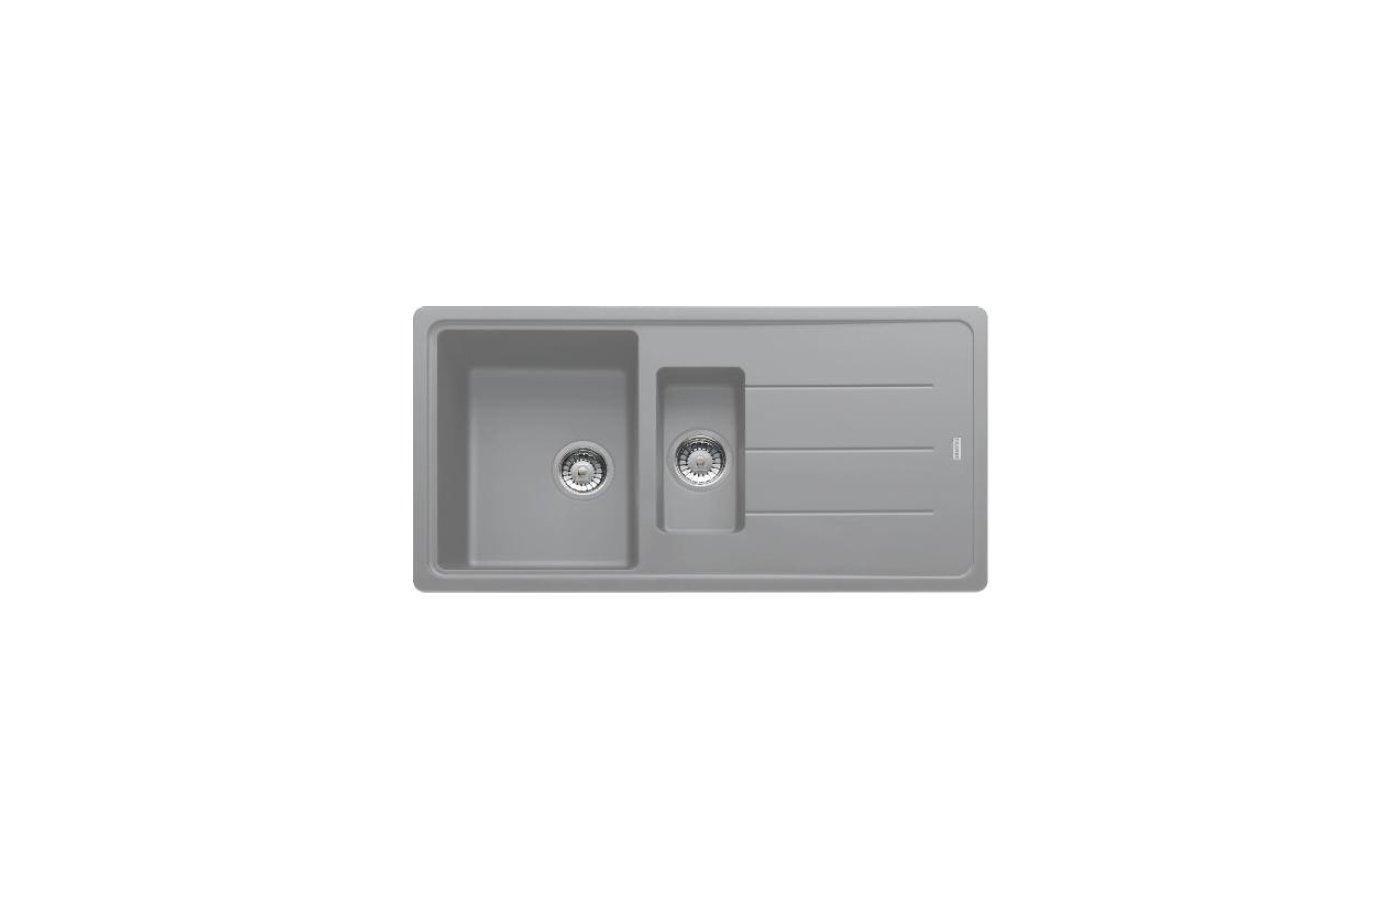 Кухонная мойка FRANKE BFG 651 серебро